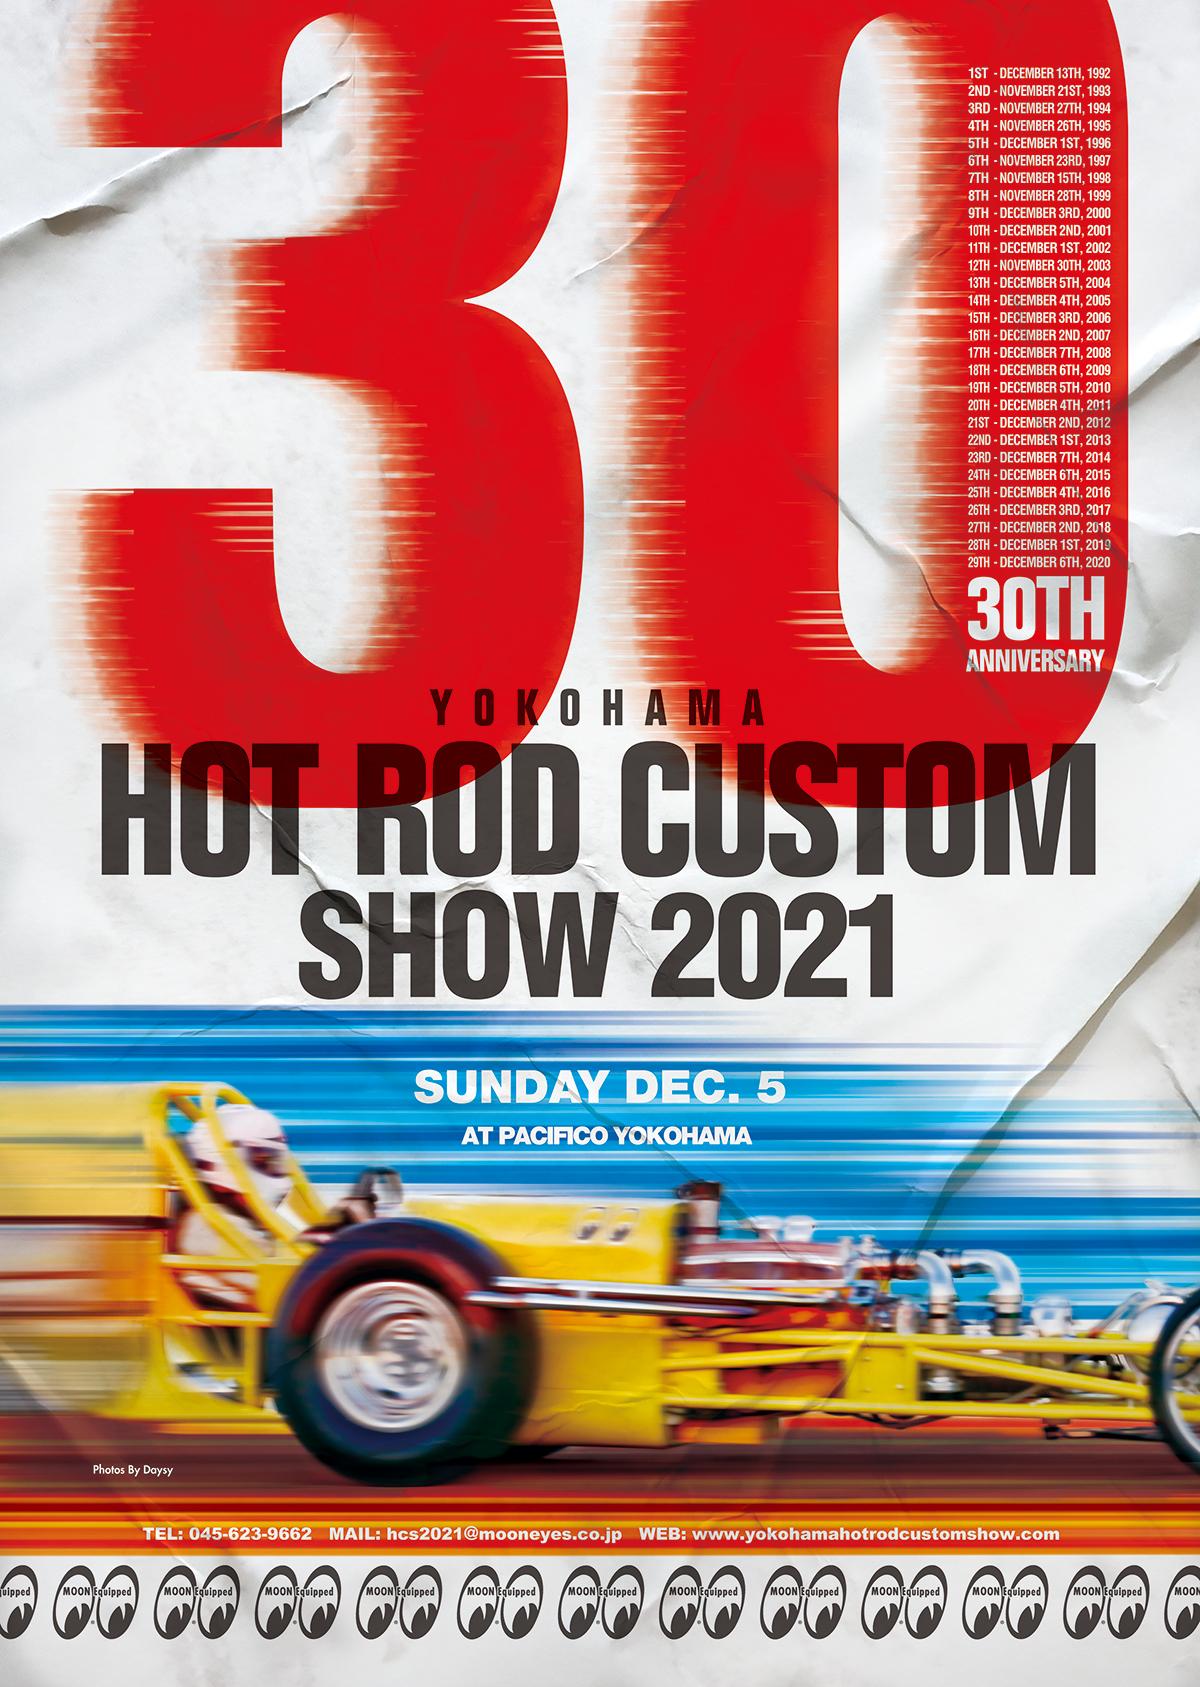 30th Anniversary YOKOHAMA HOT ROD CUSTOM SHOW 2021